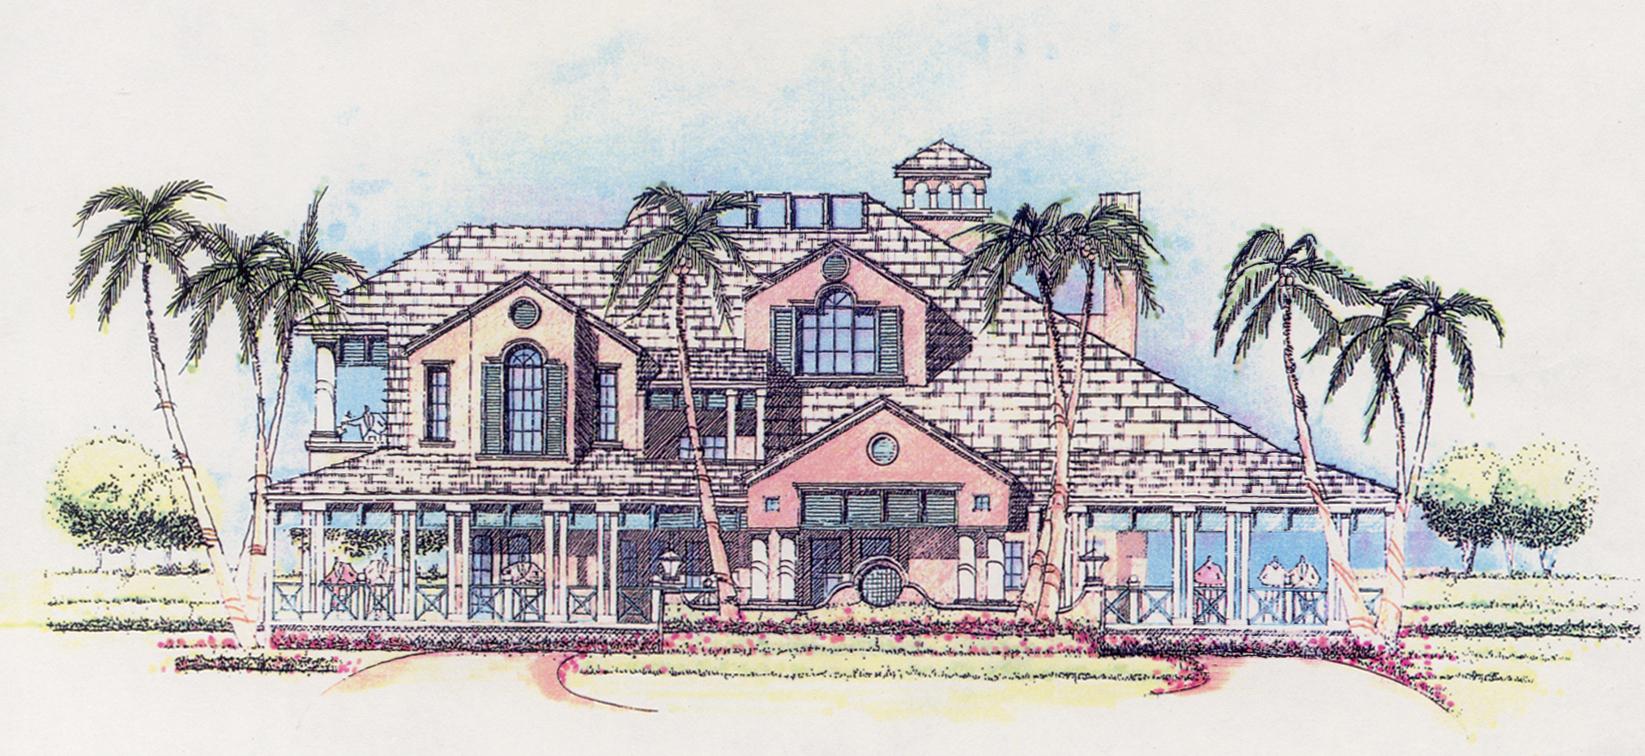 Bimini Bahamas Golf Clubhouse Design.jpg